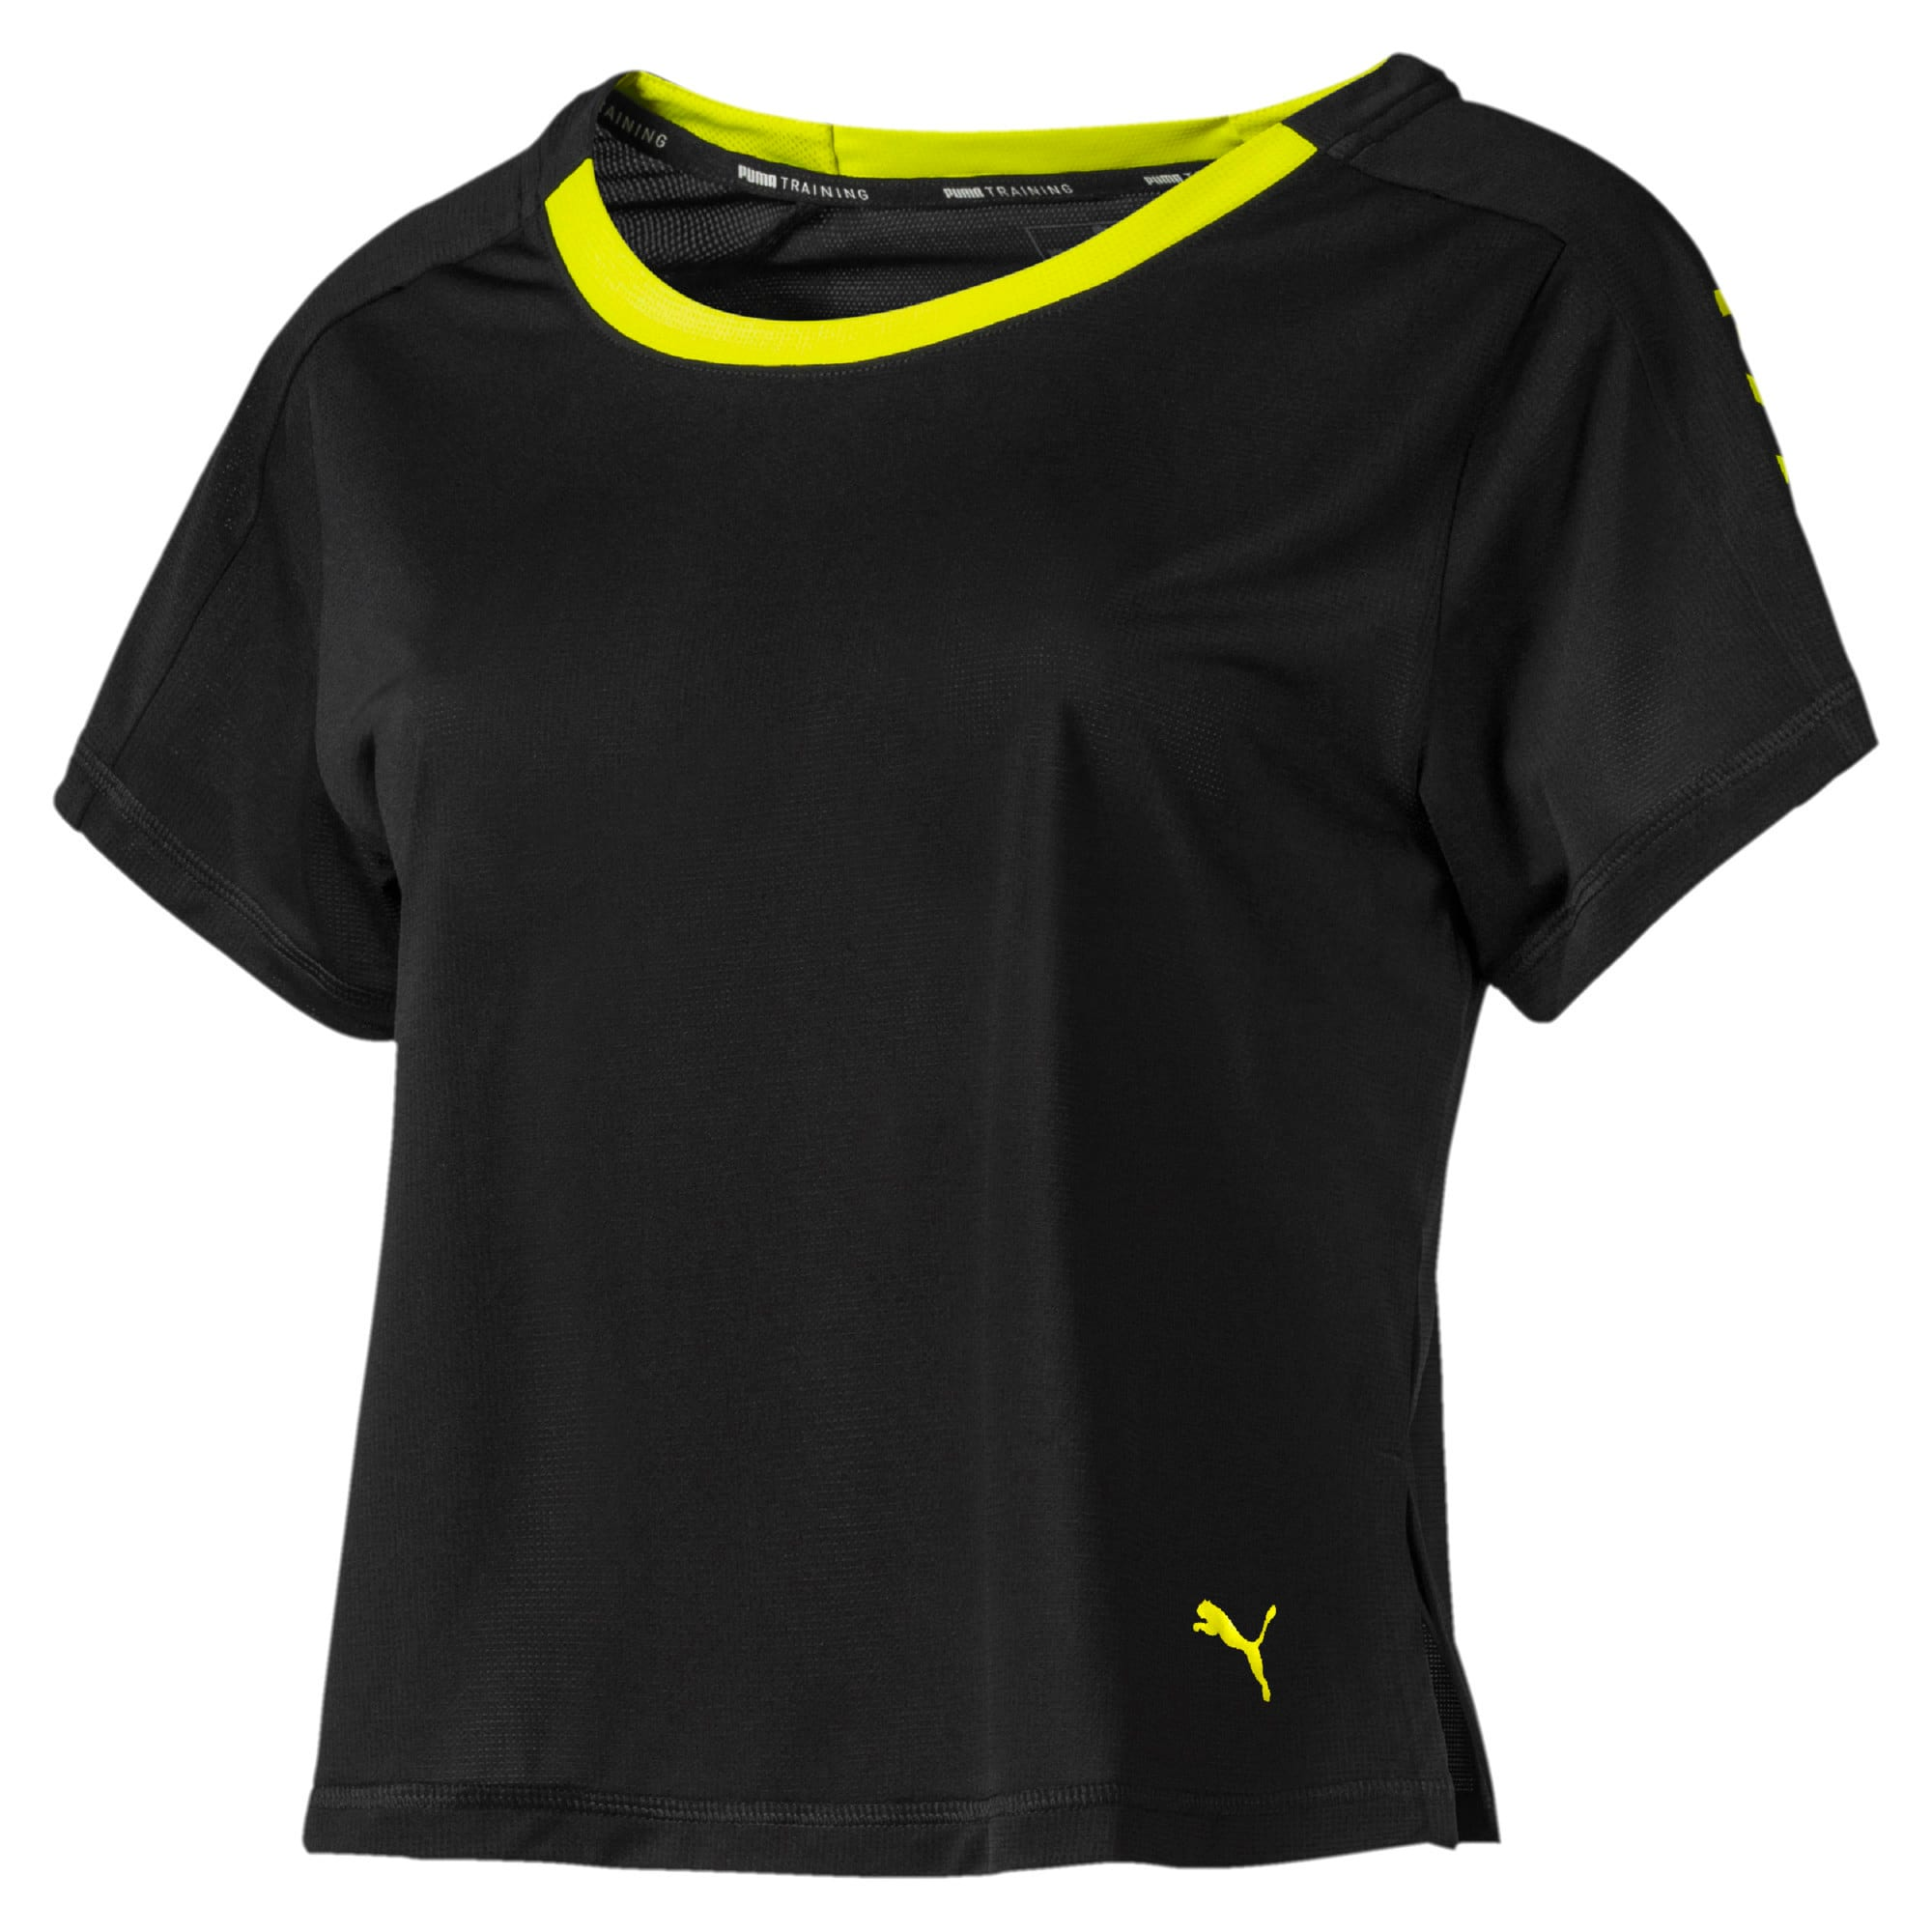 Thumbnail 4 of Cropped Short Sleeve Women's Training Tee, Puma Black-Yellow Alert, medium-IND